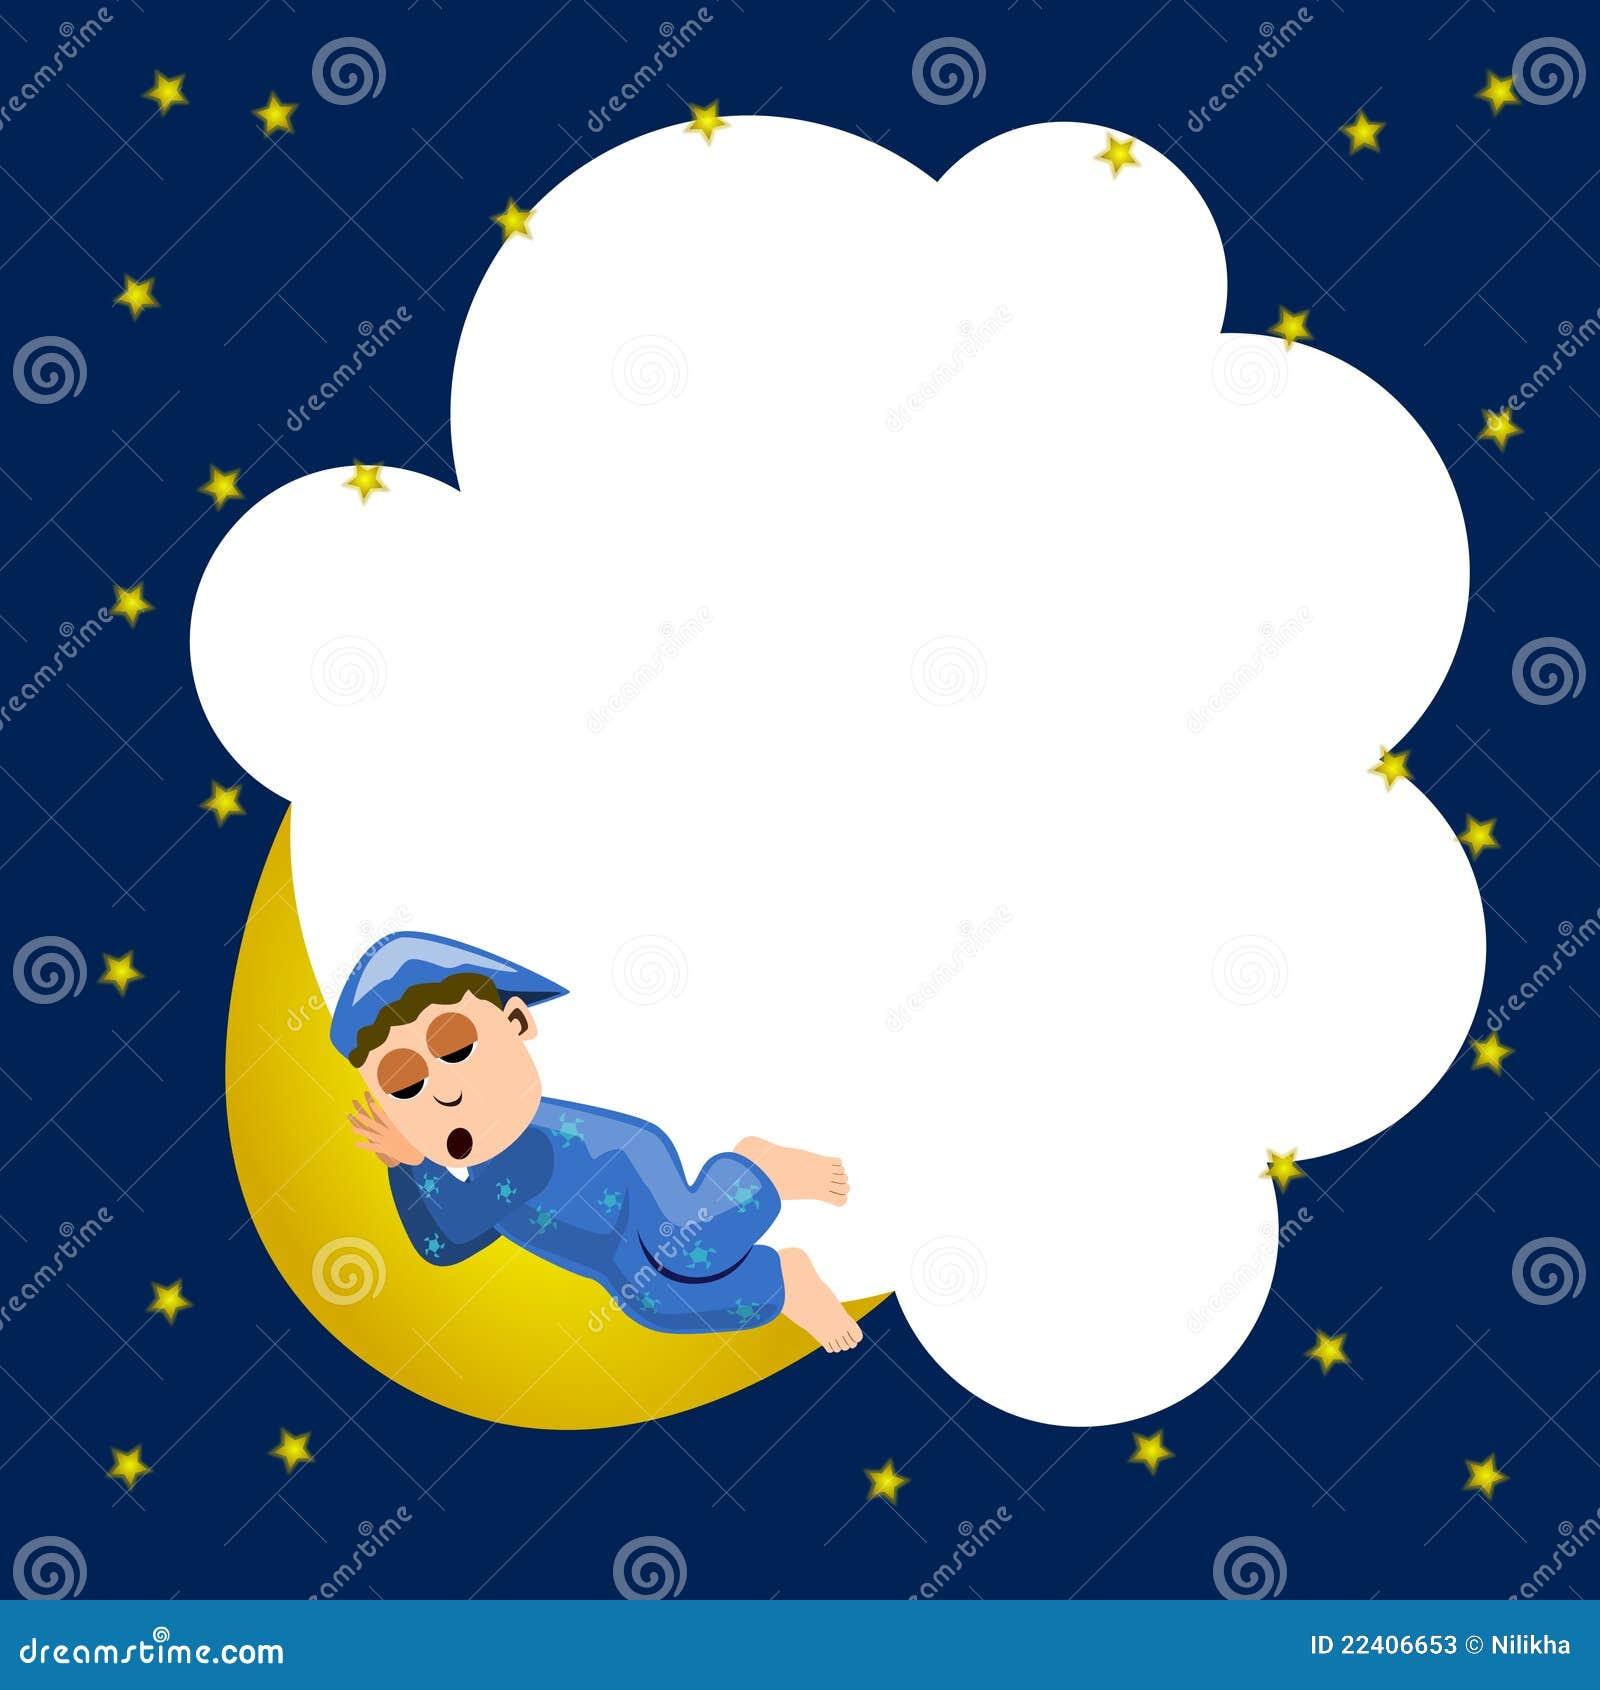 Night Time Frame Stock Illustration Image Of Illustration